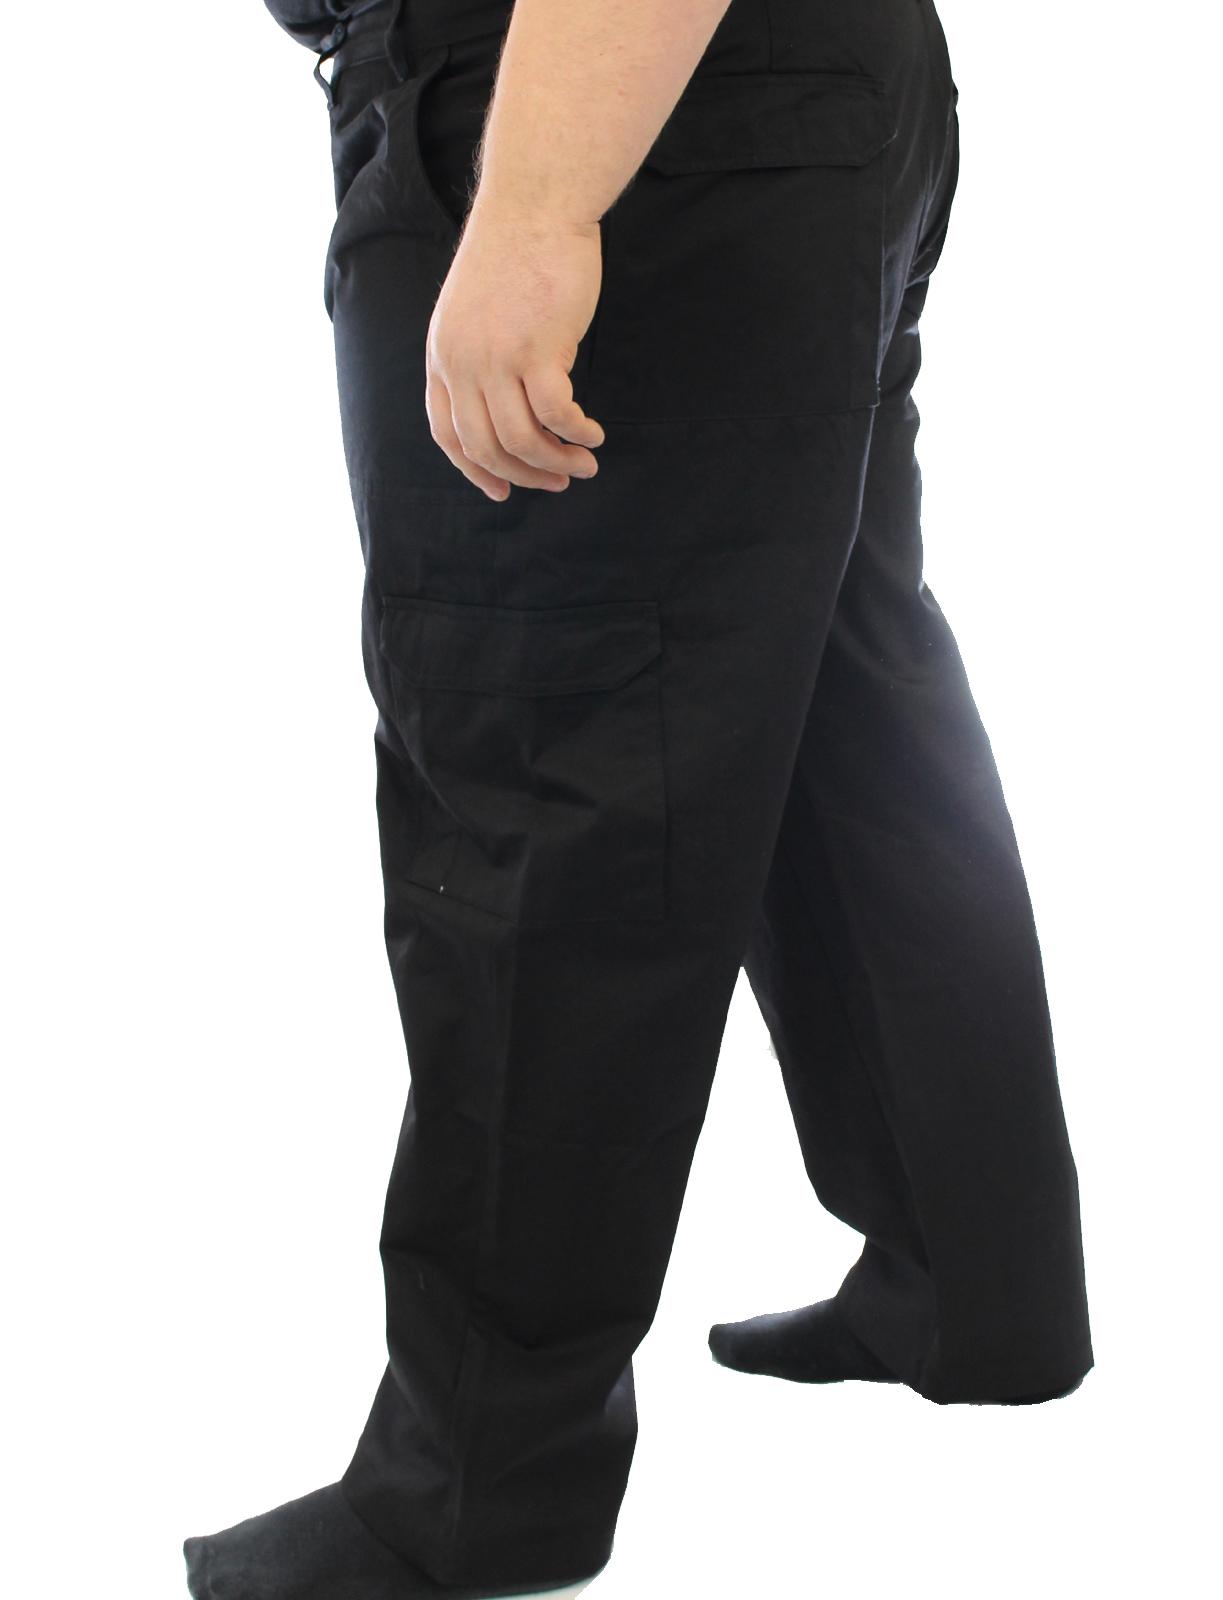 "Ed Baxter Victory - Heavy Duty Cargo Combat Trousers - Black - 54"" Waist, 30"" Leg"